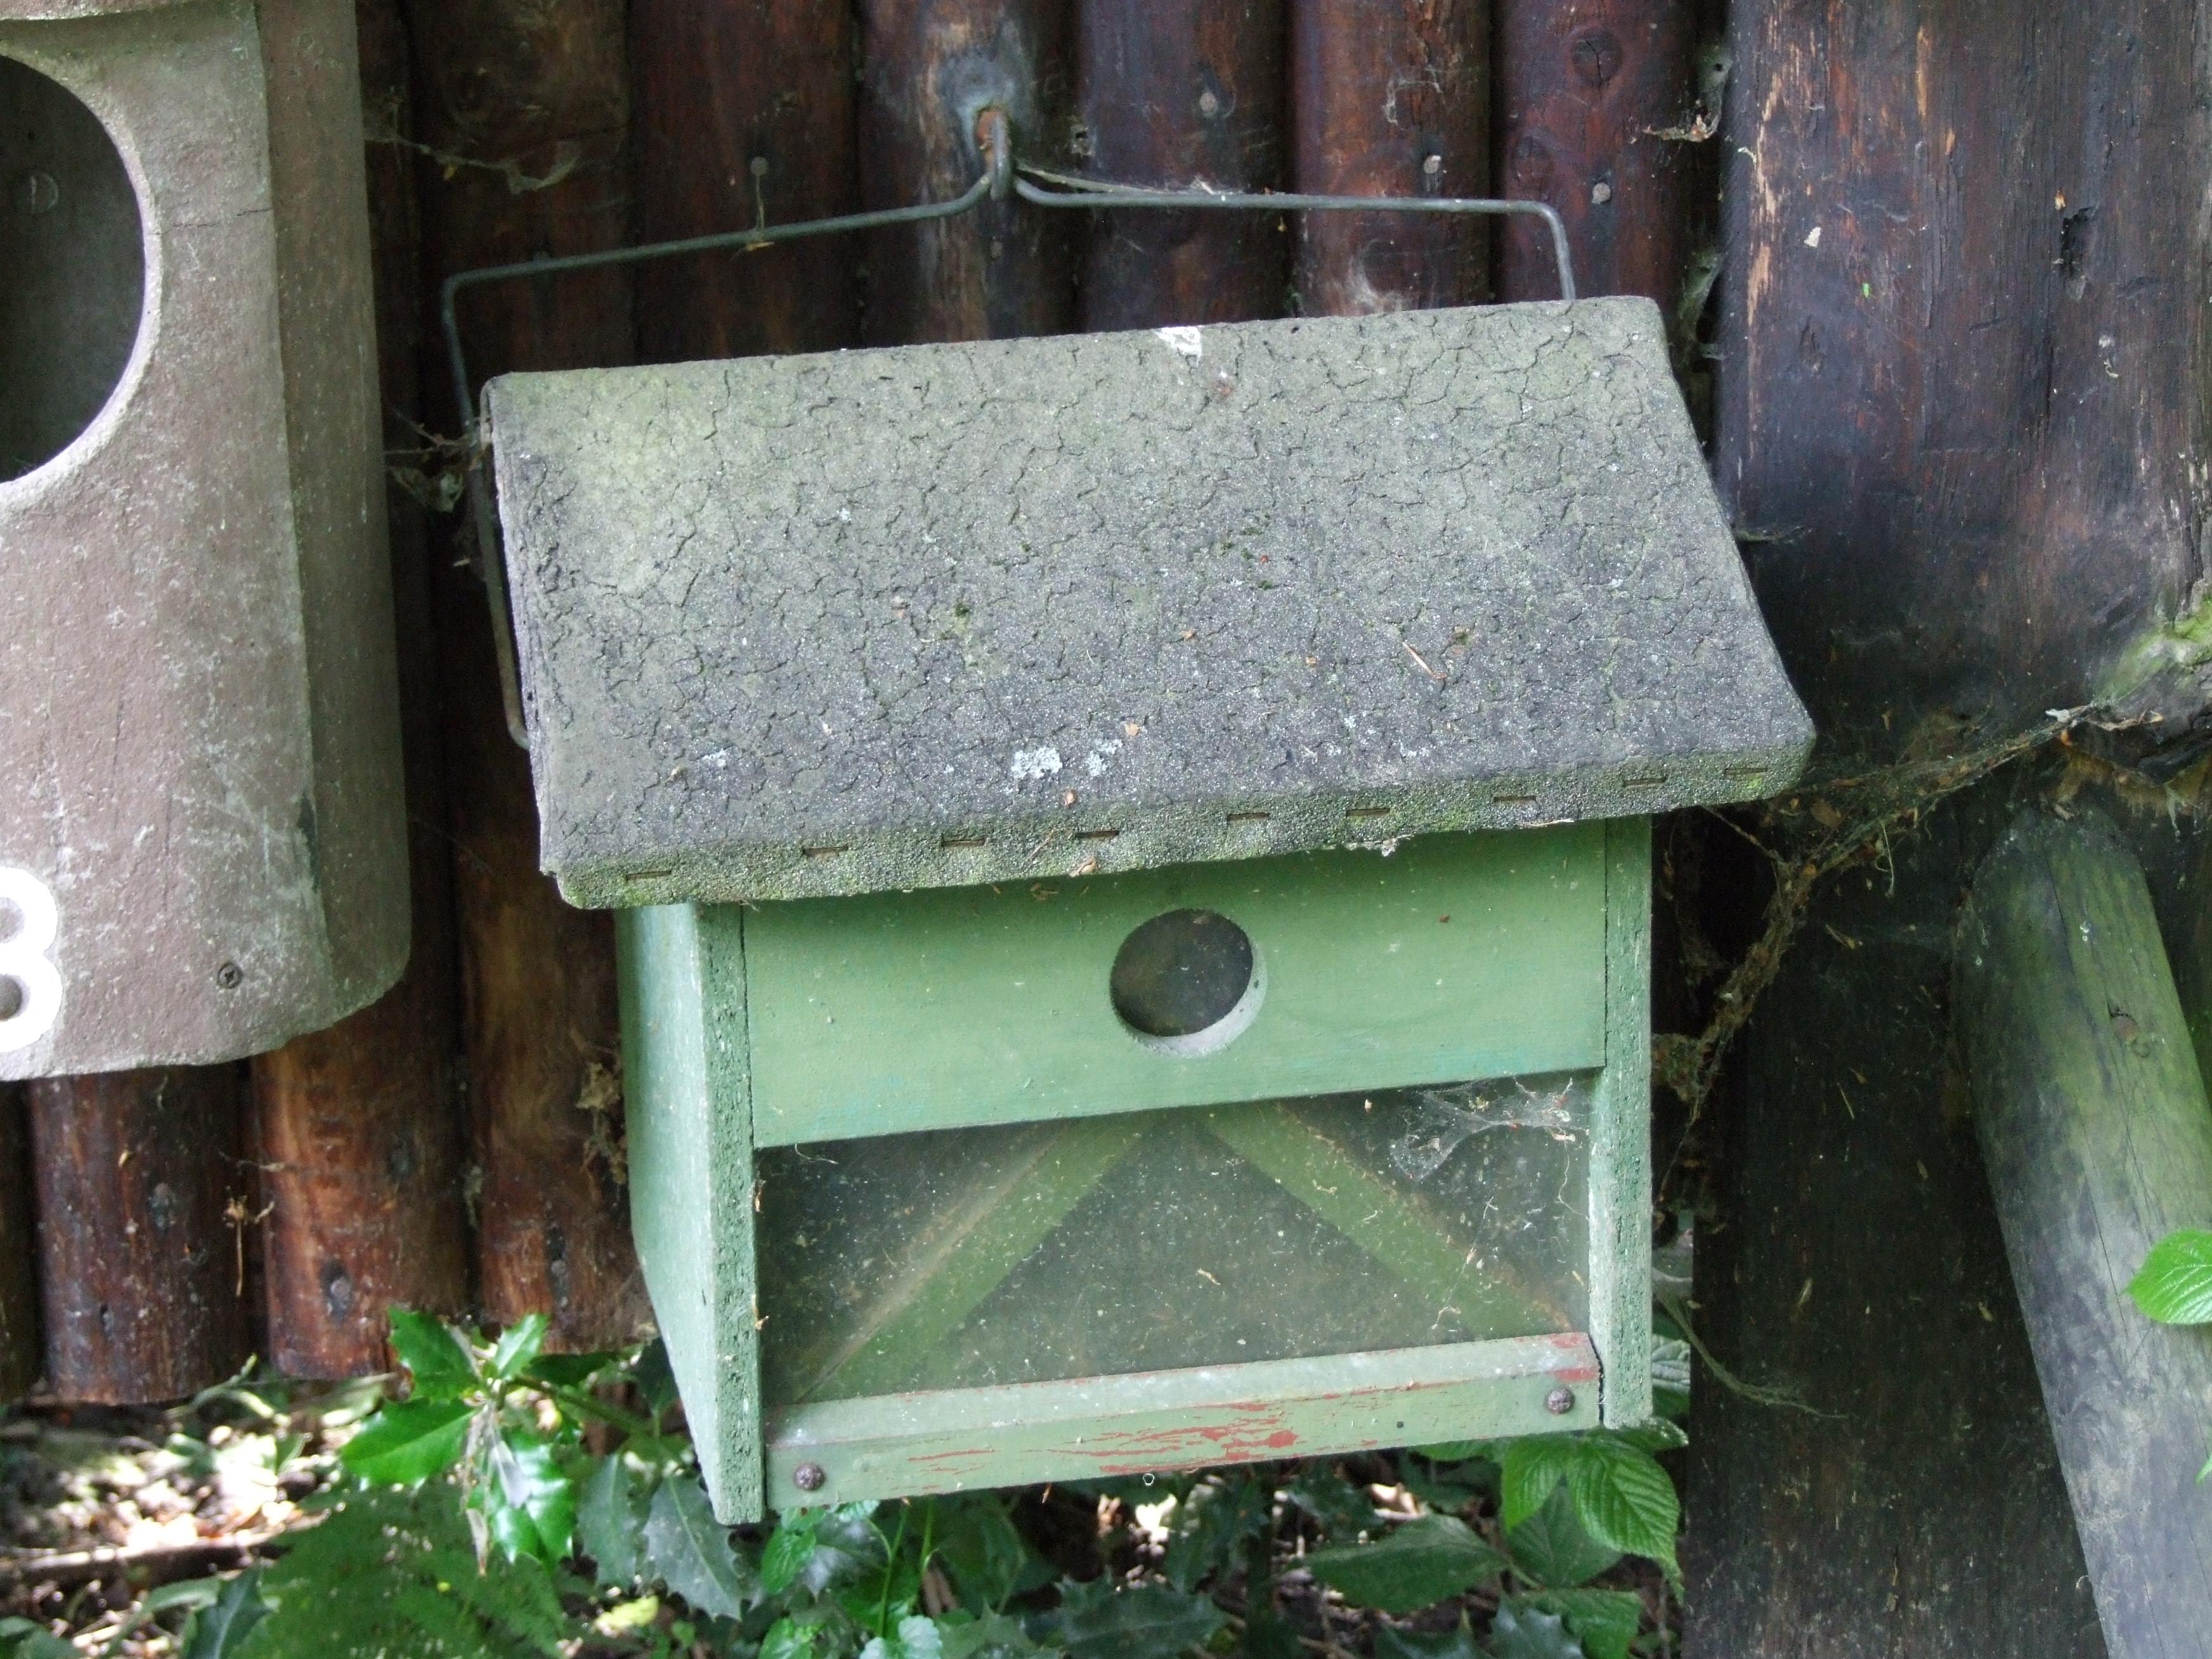 file vogelhaus futtersilo f r meisen dscf0532 jpg wikimedia commons. Black Bedroom Furniture Sets. Home Design Ideas